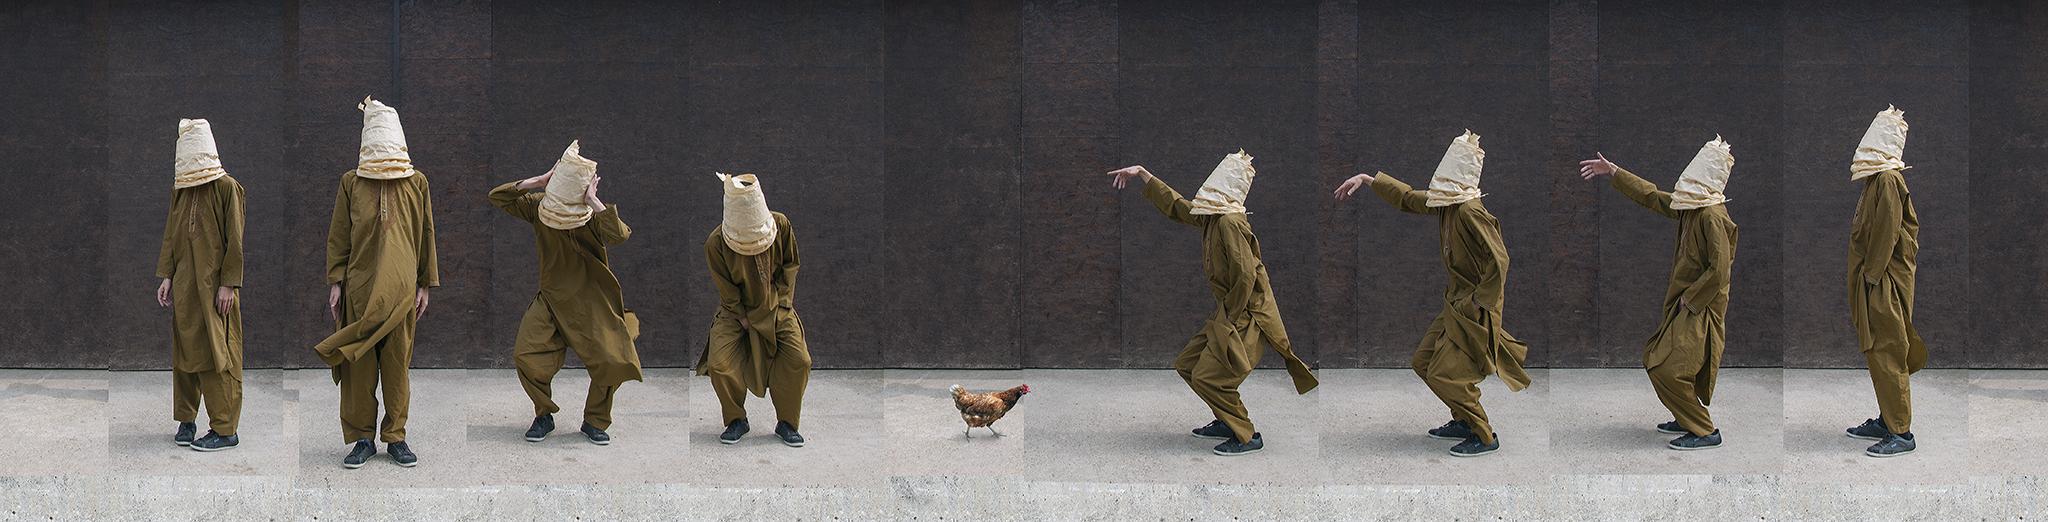 Rahman Hak-Hagir - GHOST AND GOBLINS, JUMP AND RUN (2013)